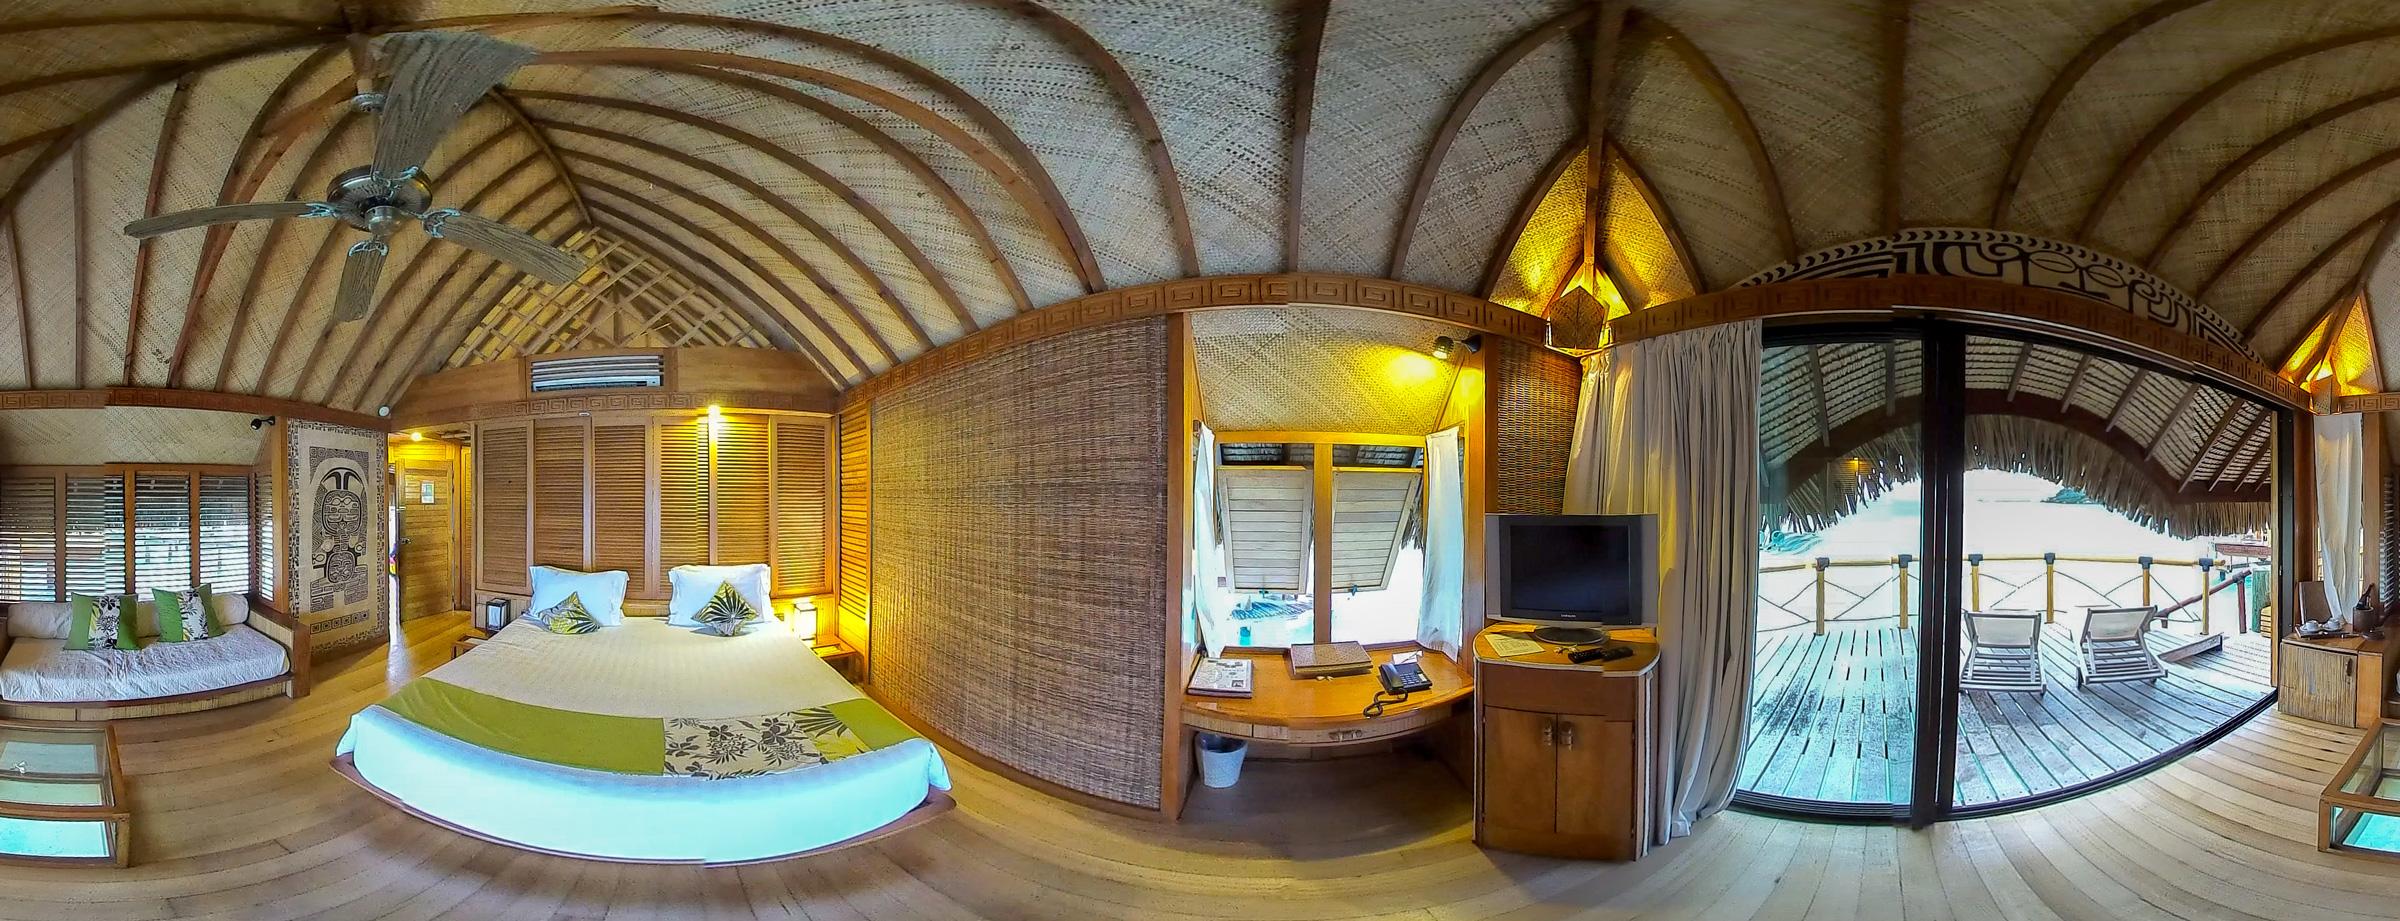 Take-The-Ride-VR_TahitiVR_Bungalow_Interior_2400px.jpg